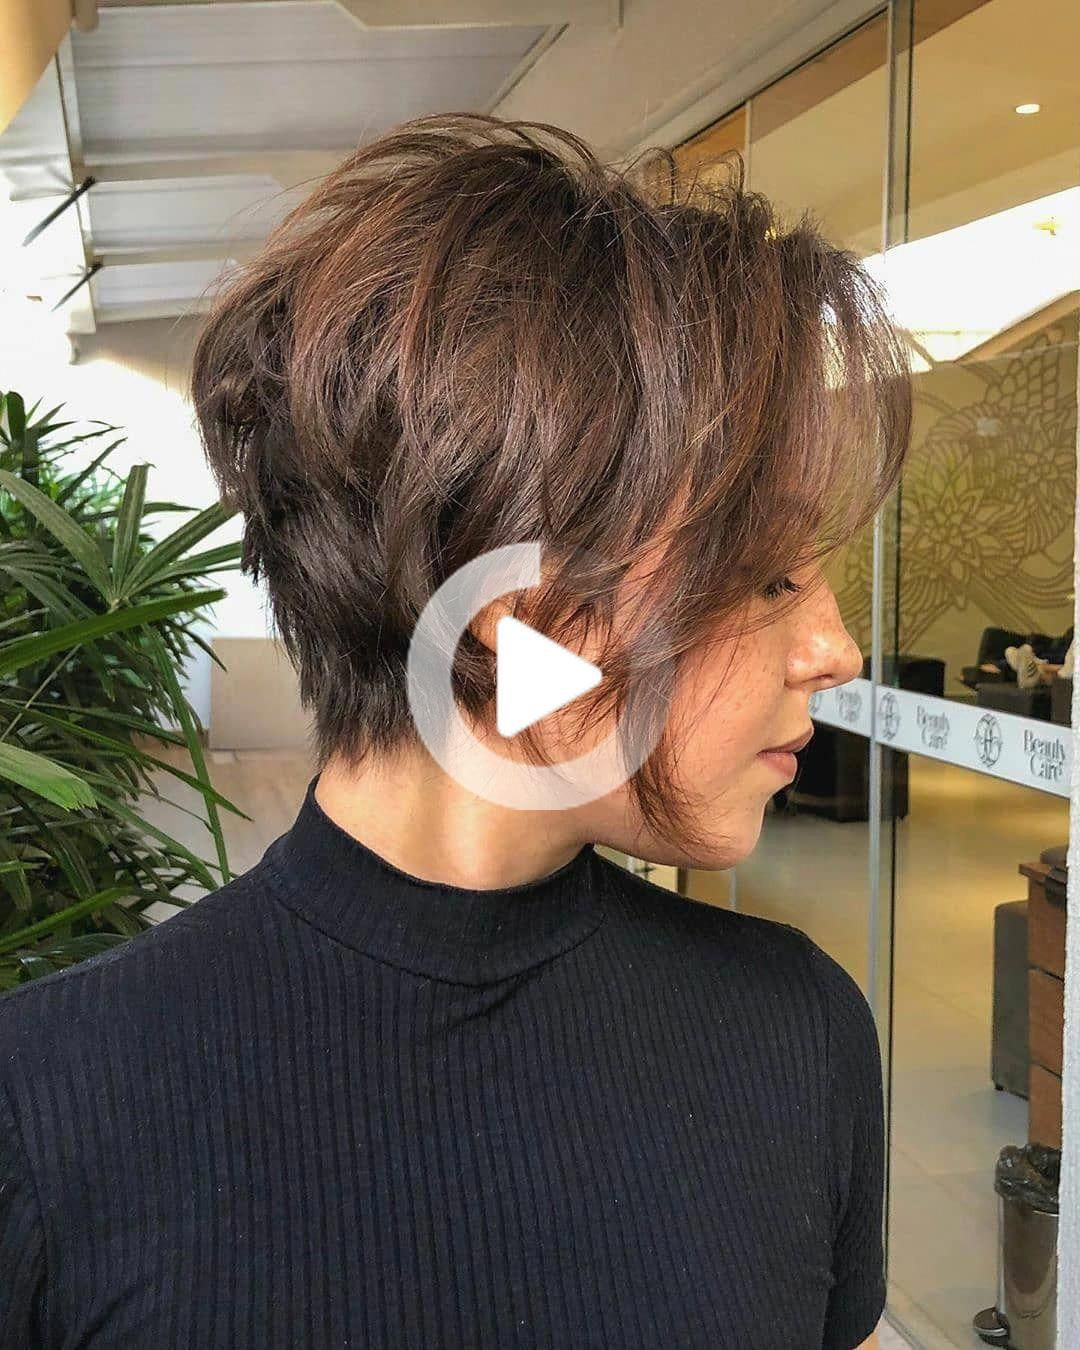 52 Gorgeous Short Haircuts For Women 2020 Short Haircuts For Fine Hair Short Haircuts For Thick Hair Beste Kapsels